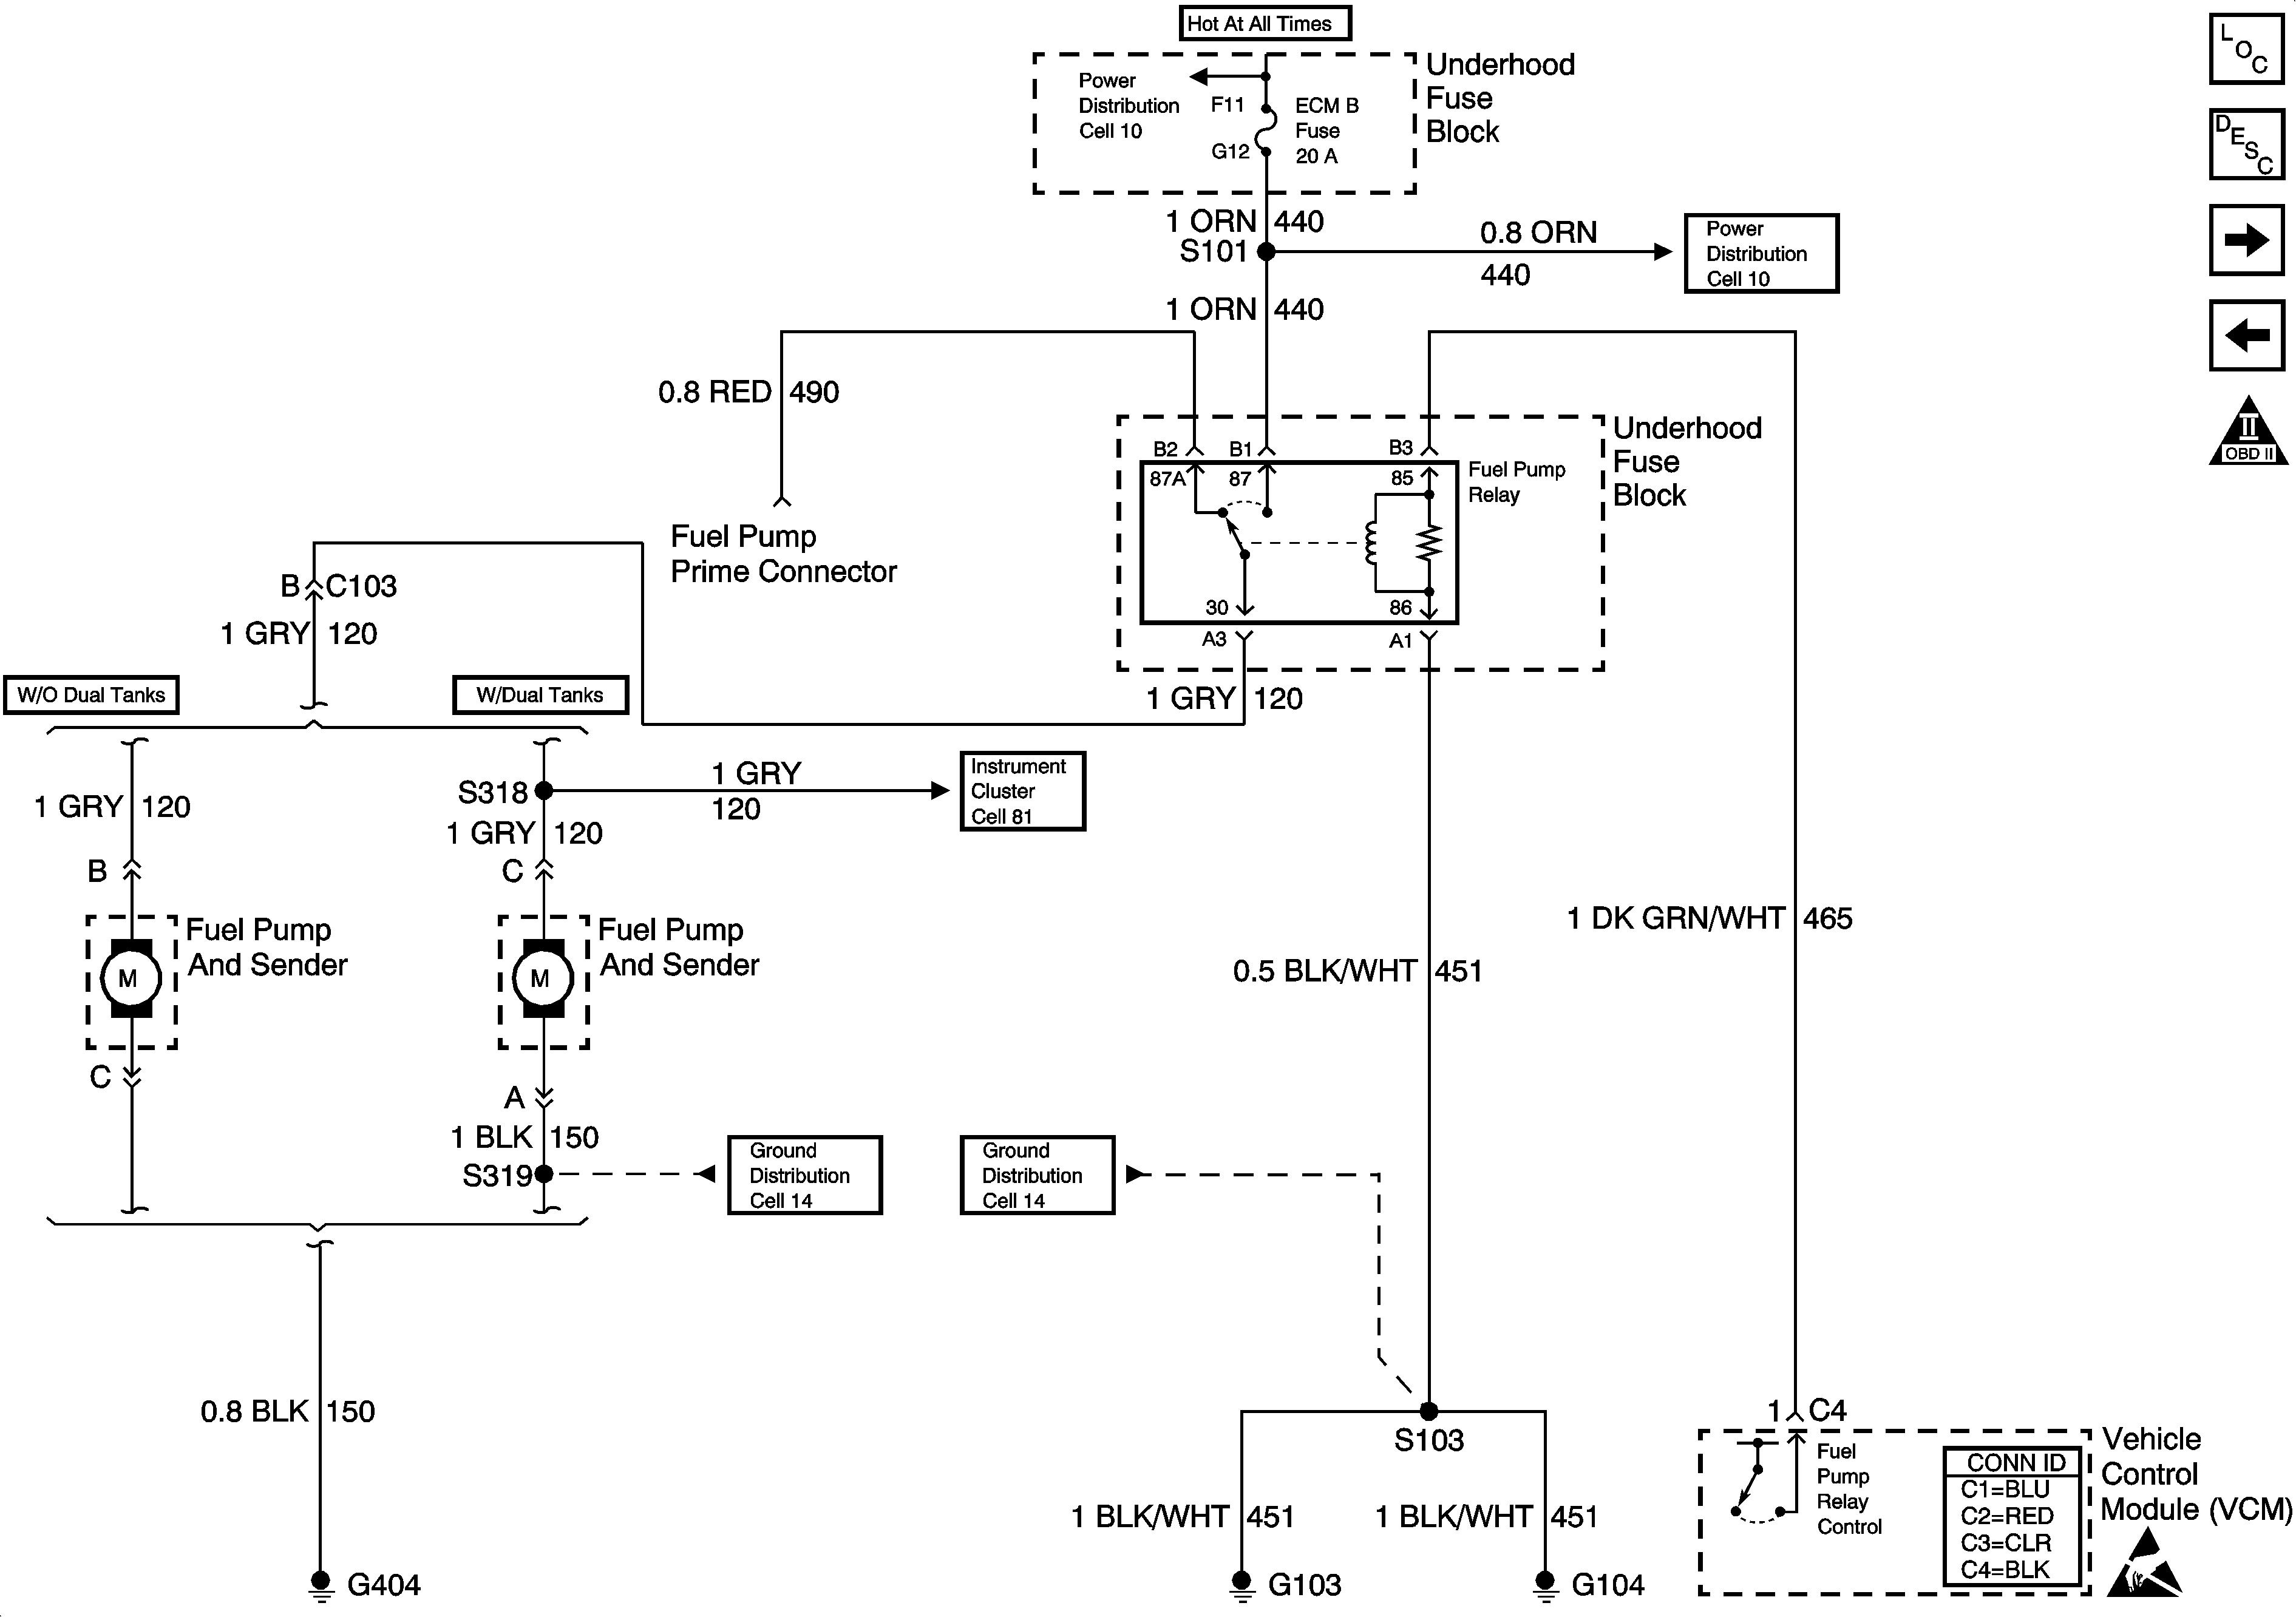 bbbind com wiring diagram Download-bbbind wiring diagram 10-m